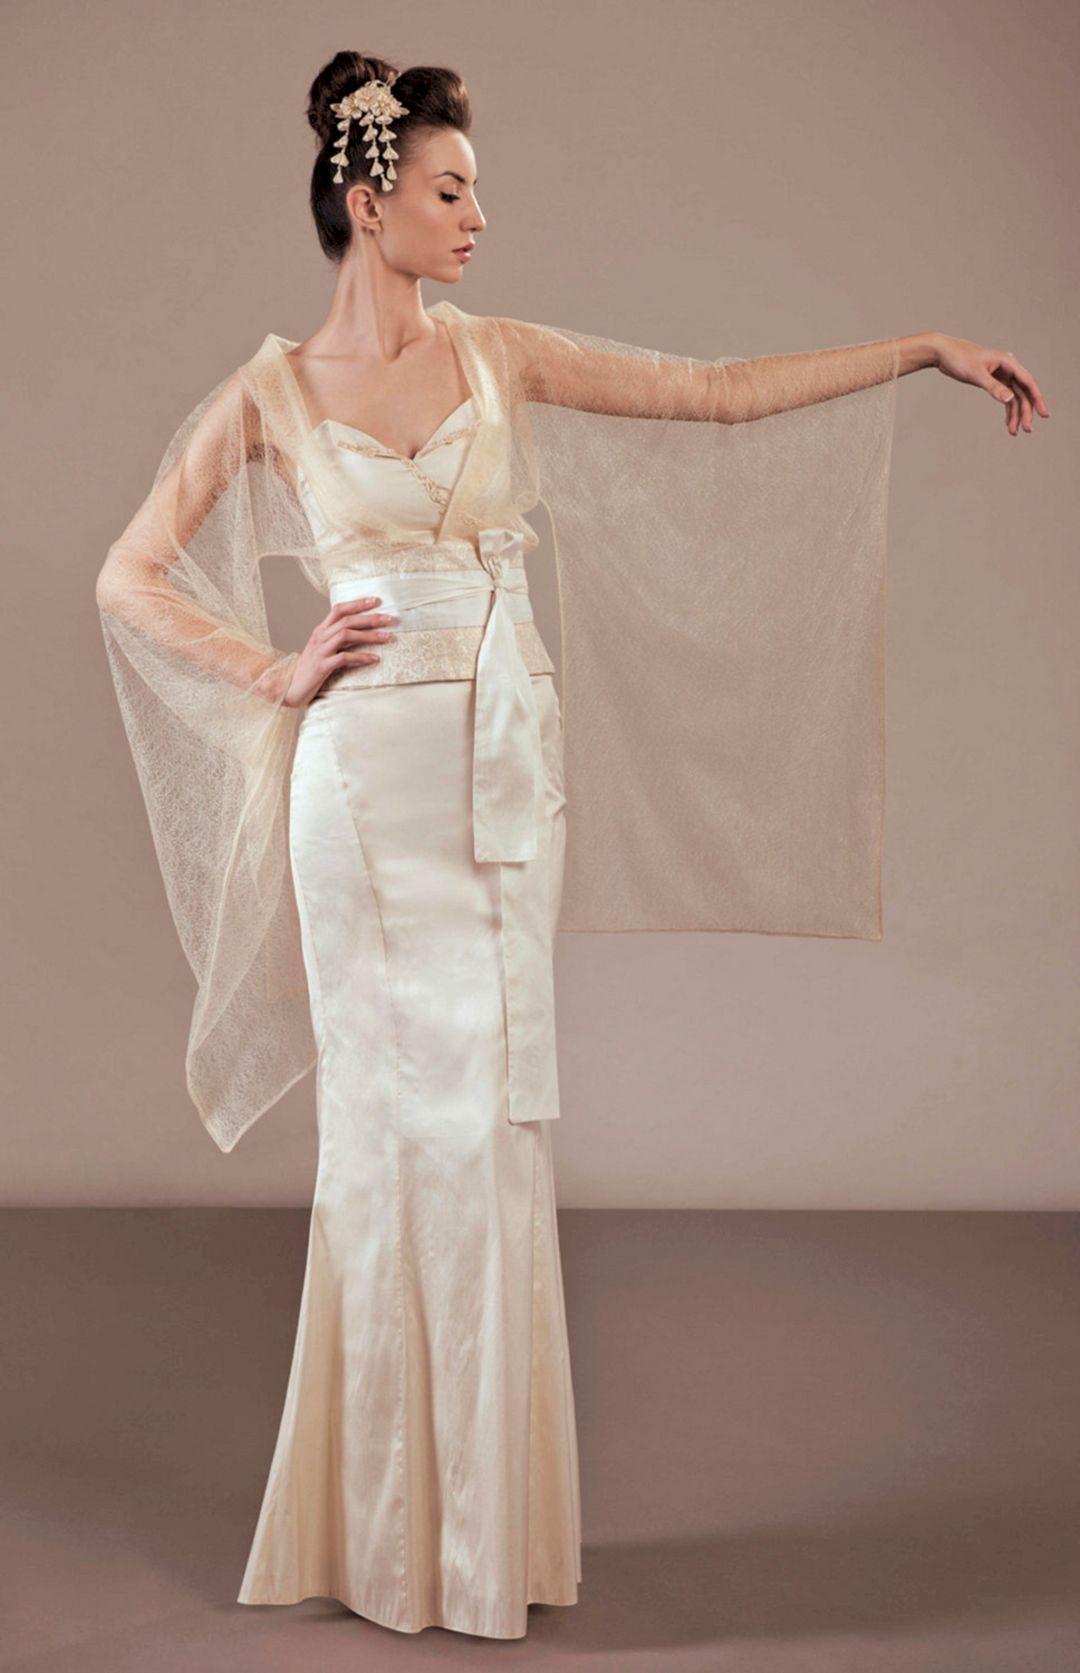 beautiful japanese wedding dress design ideas wedding dress